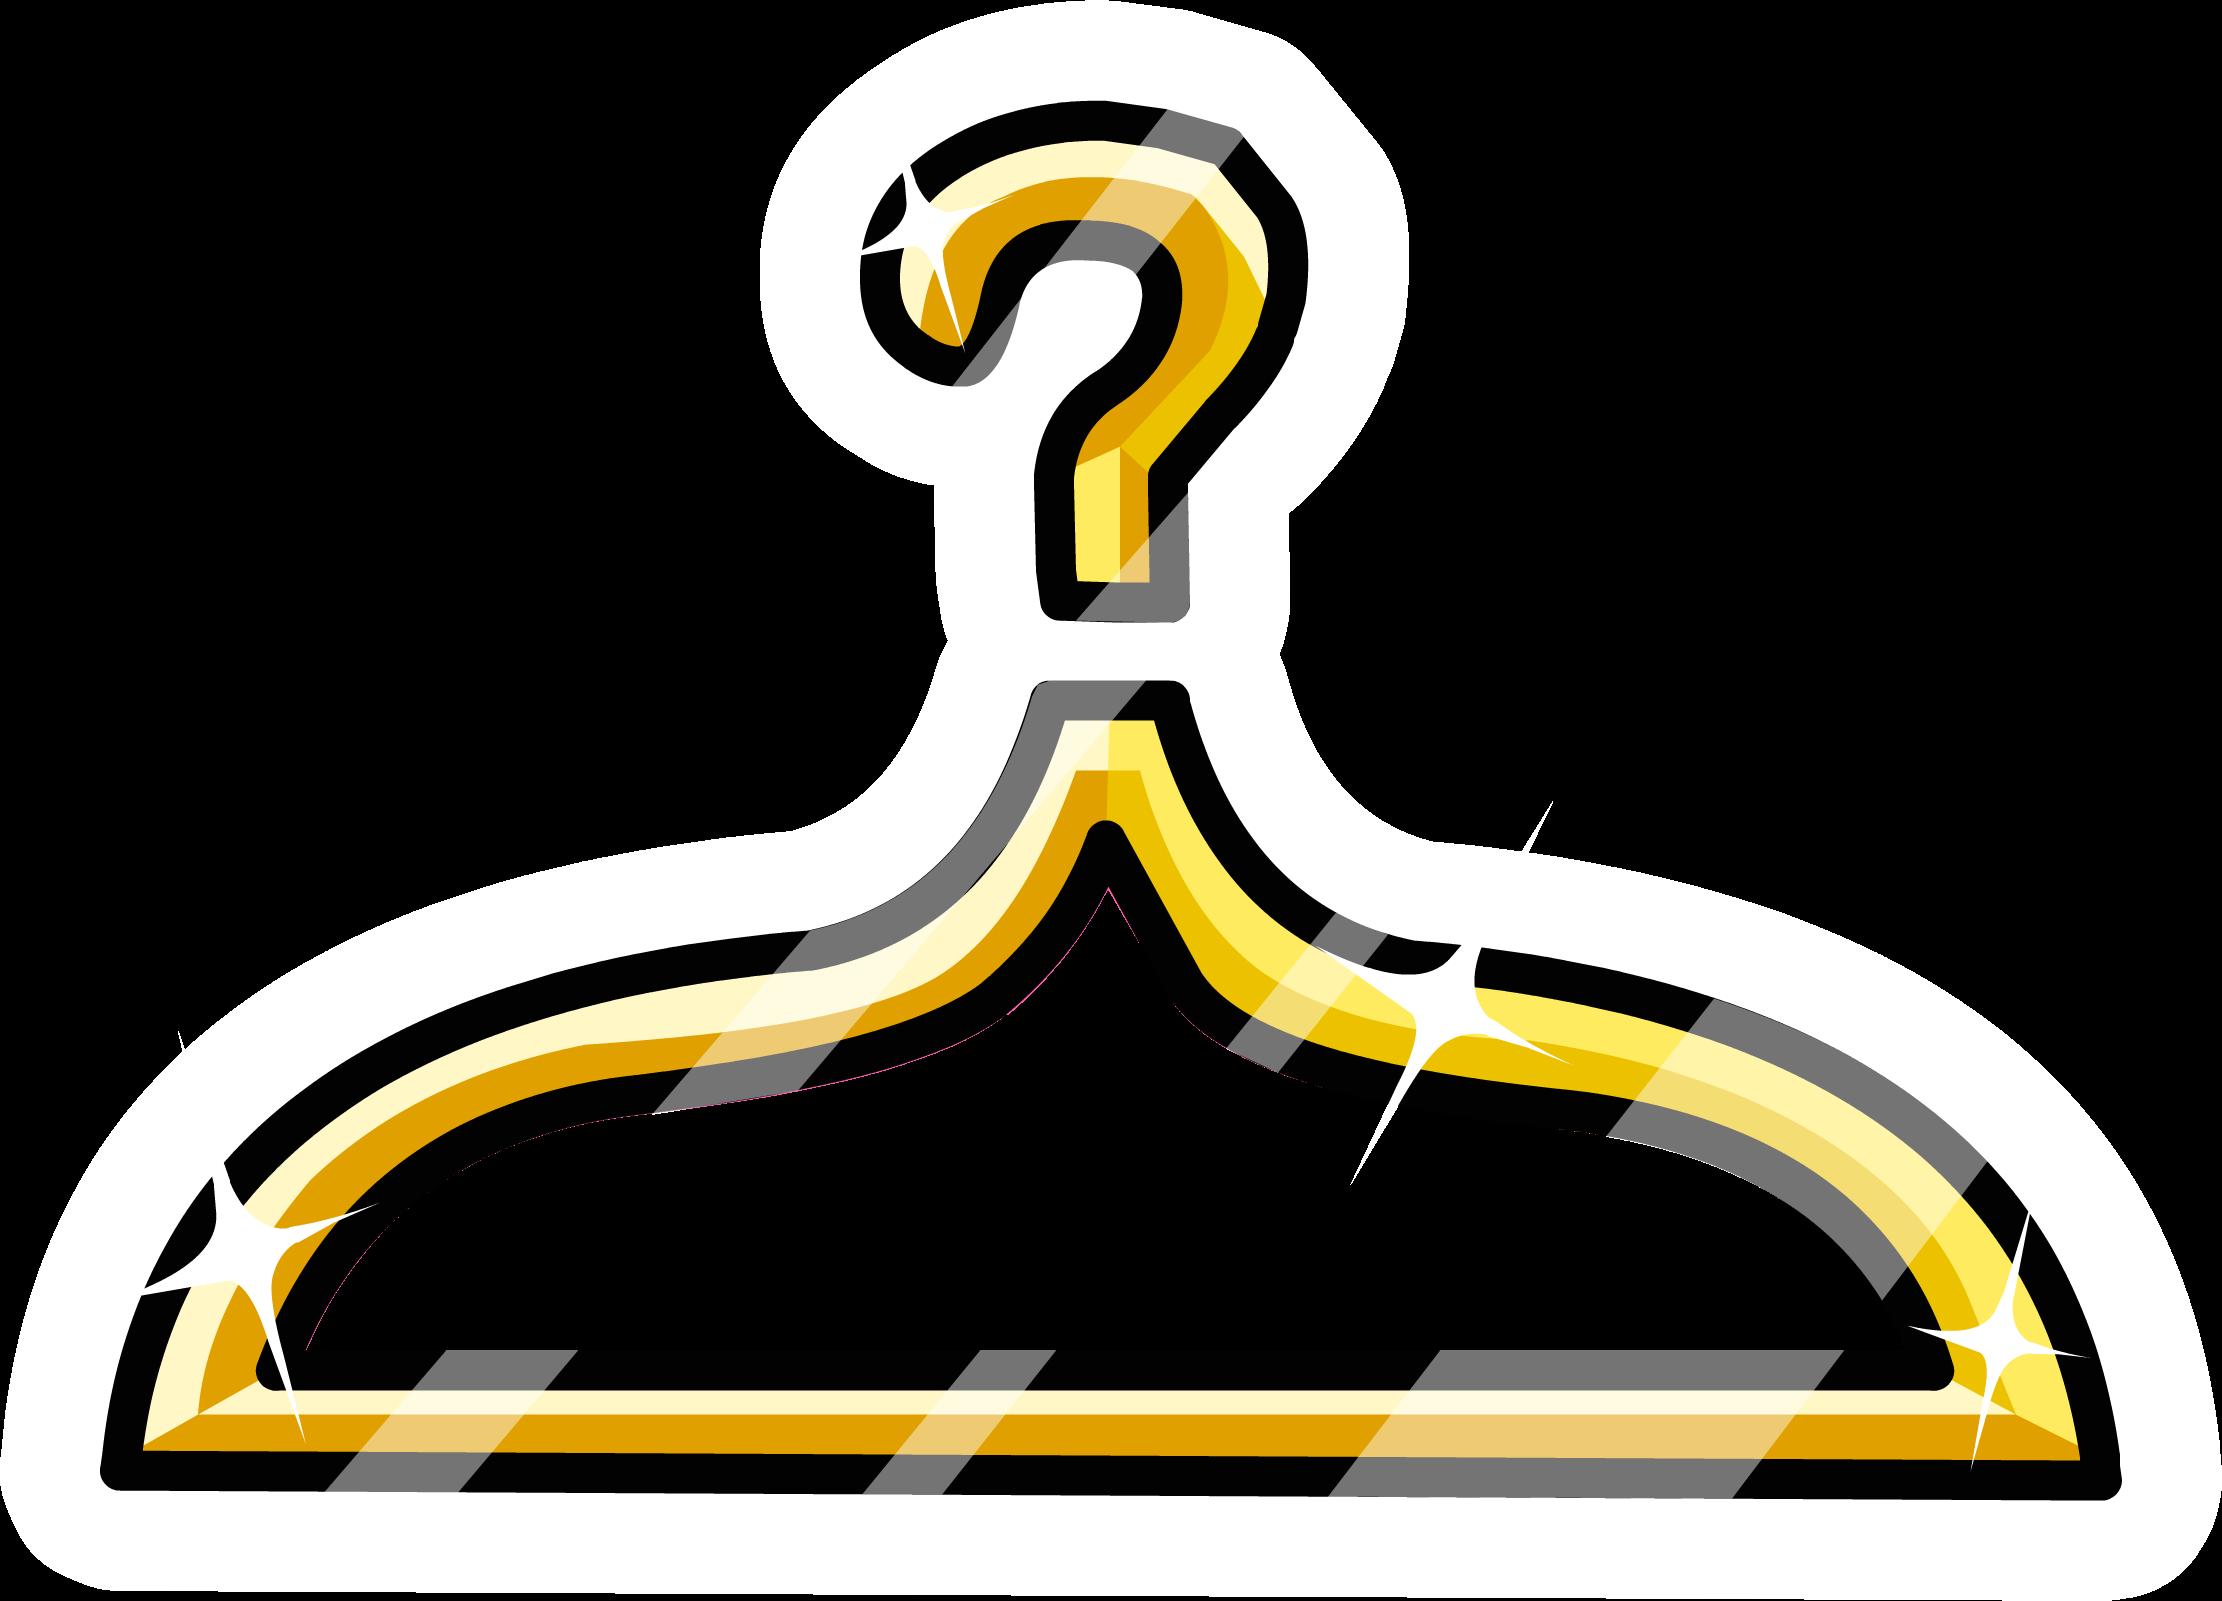 Golden Hanger Pin